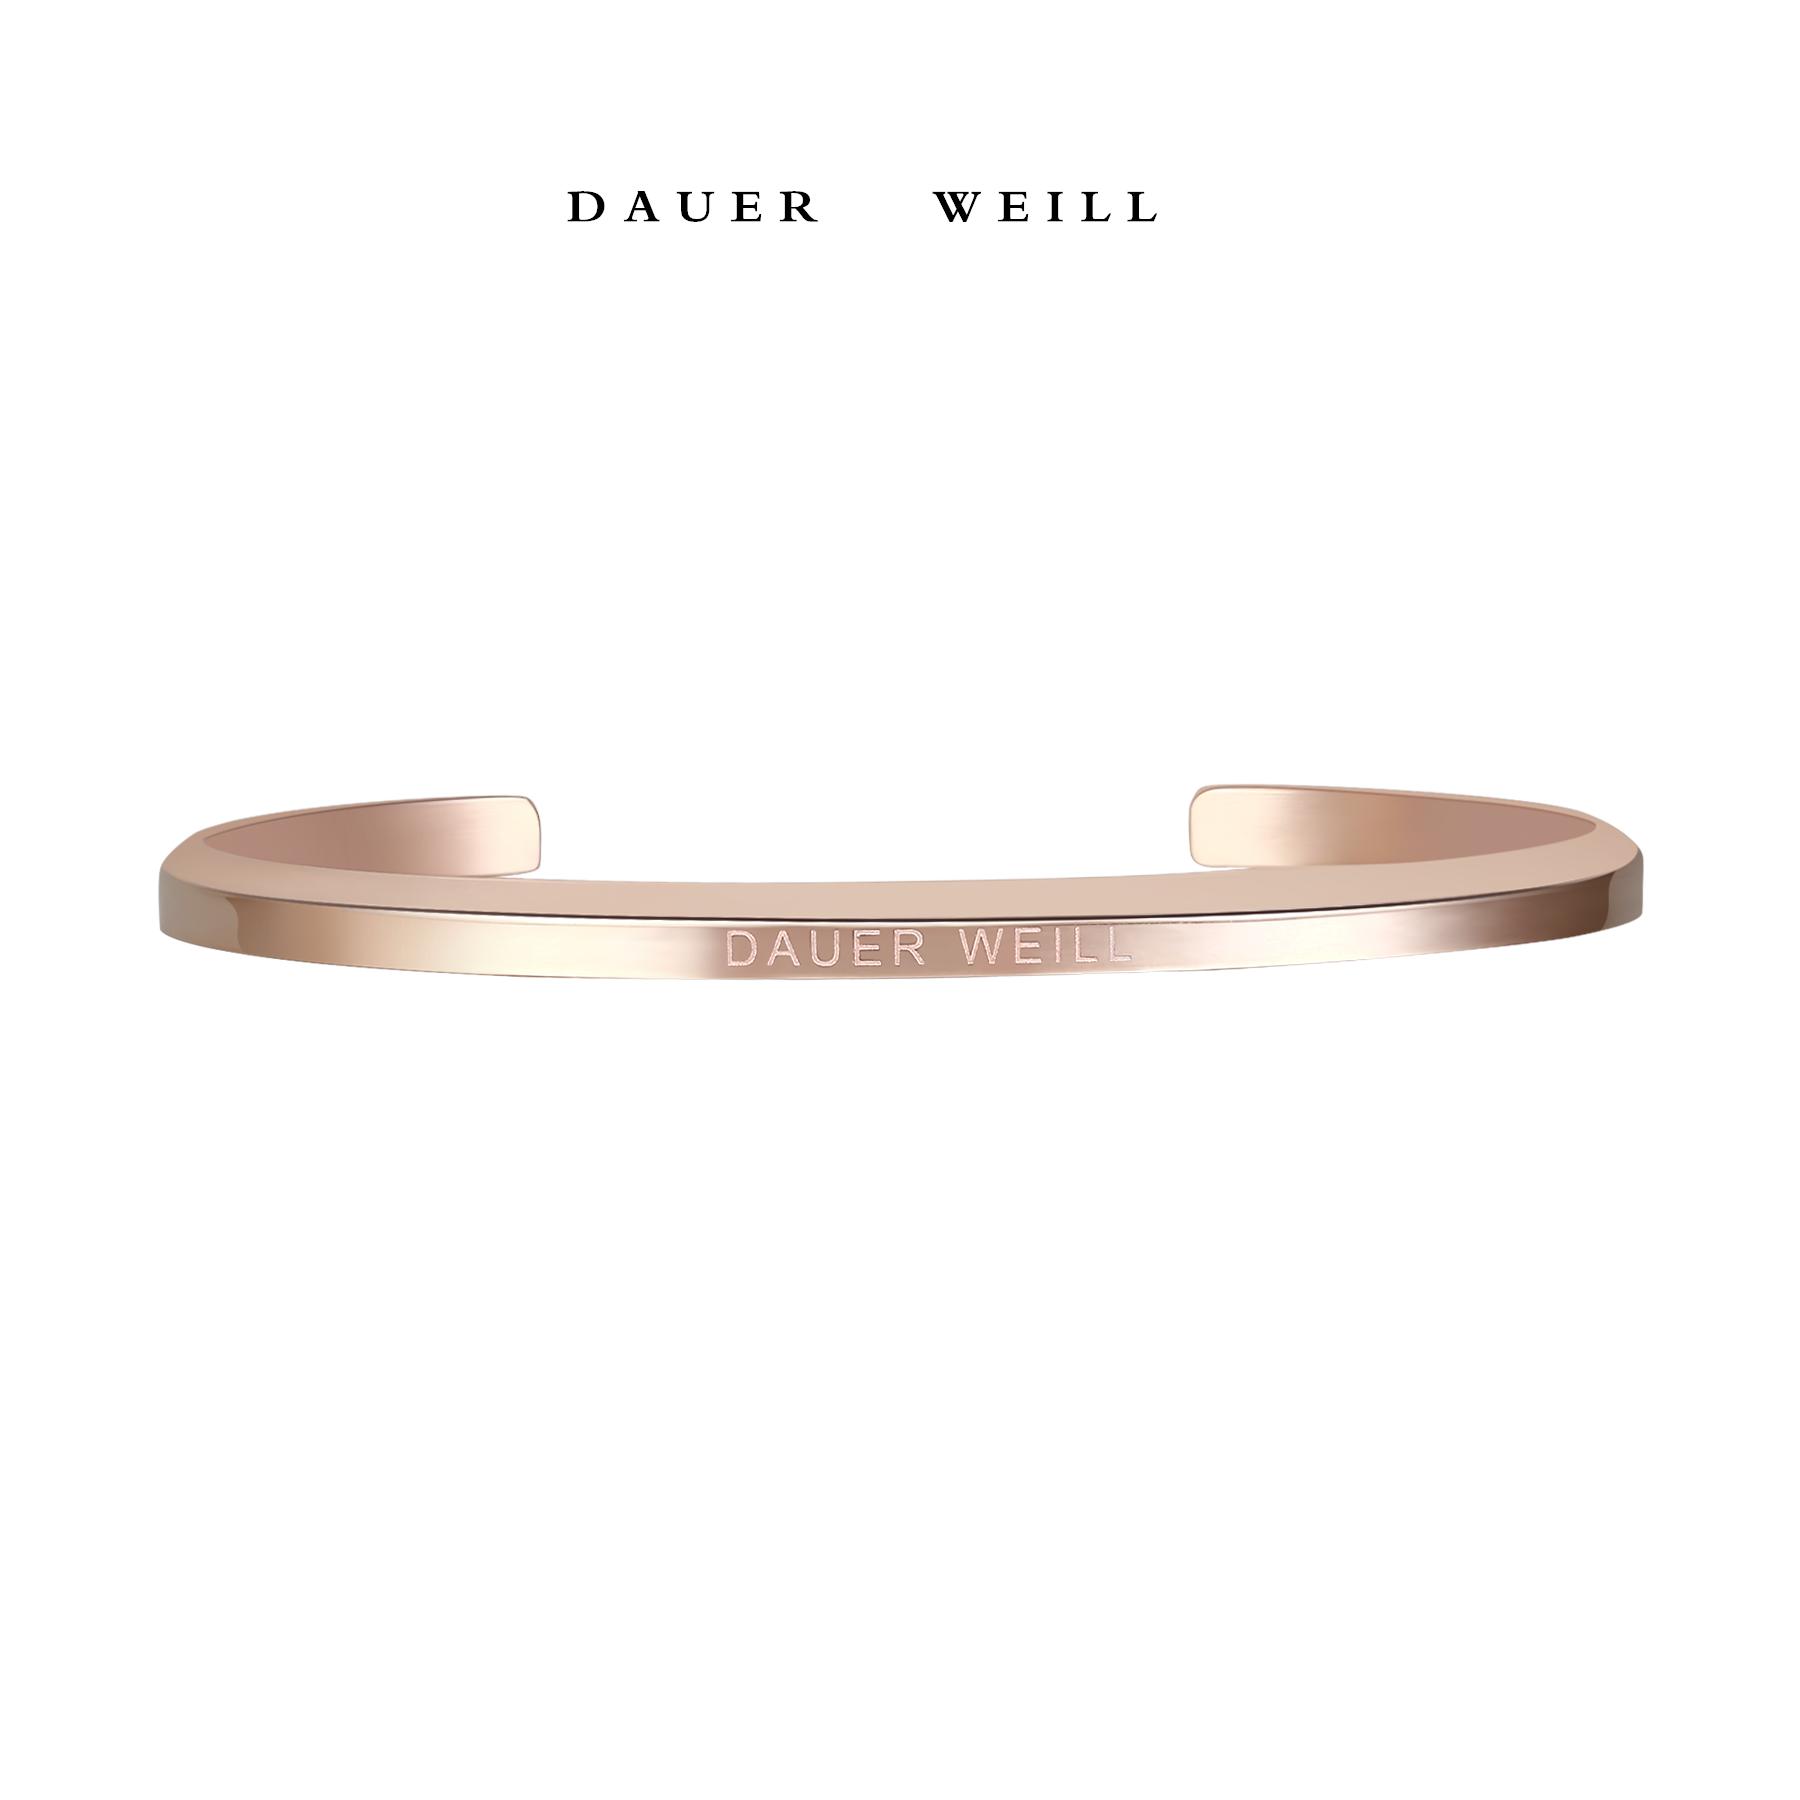 Dauer Weill正品dw手镯新新款女男情侣开口玫瑰金银色钛钢女士